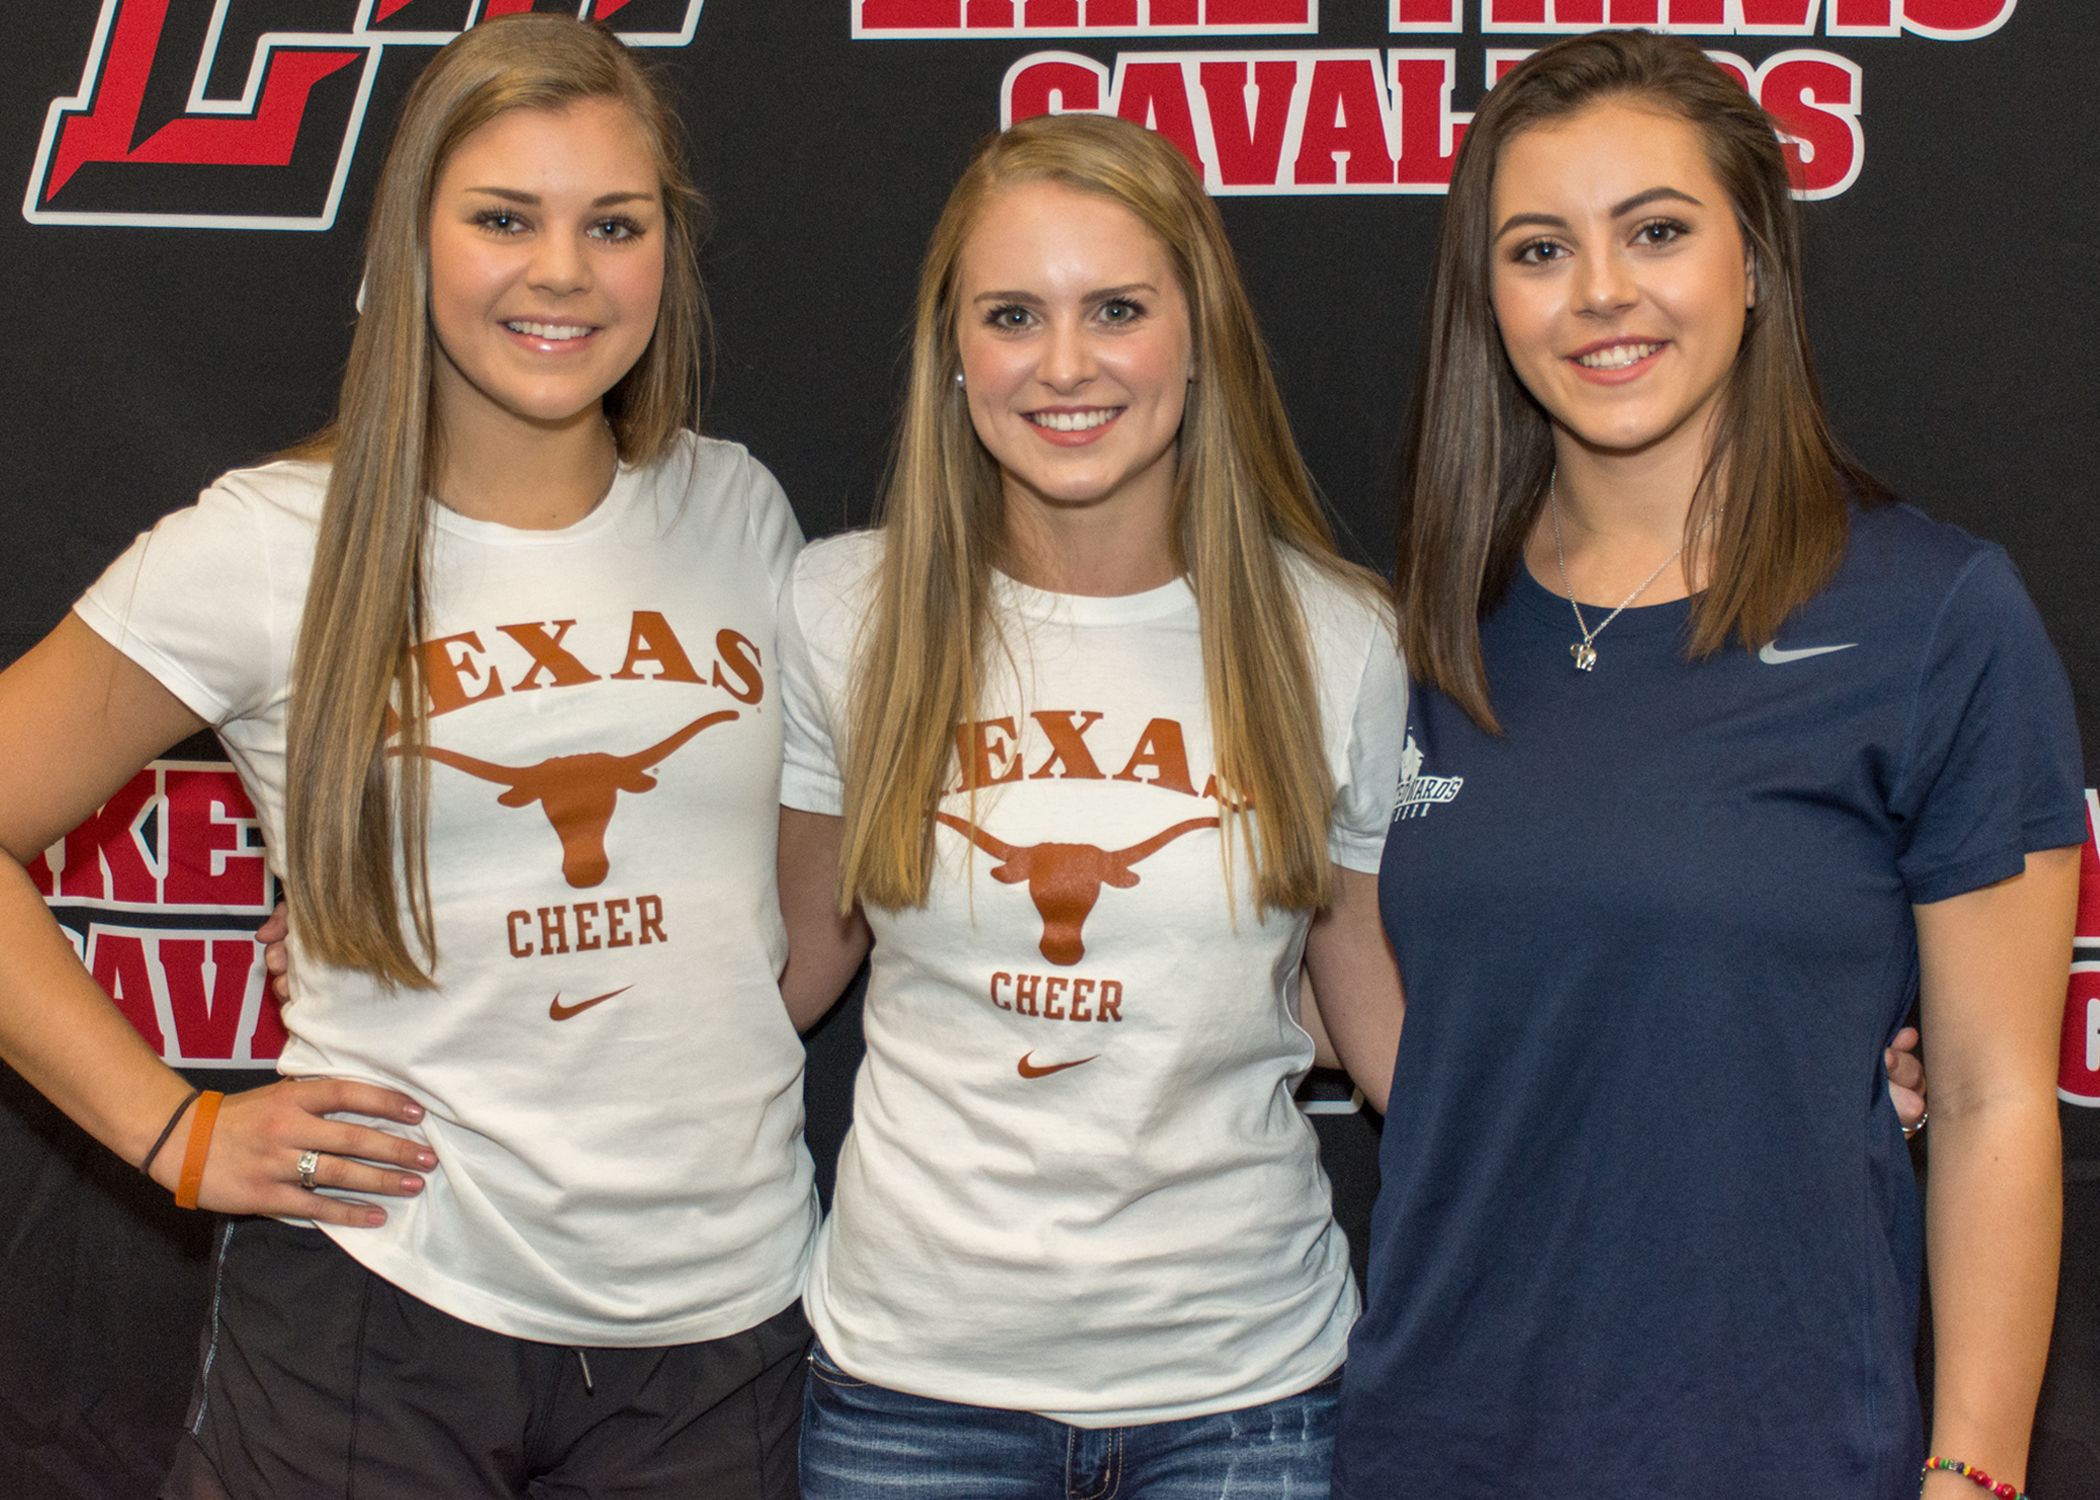 LTHS cheer student-athletes:  Faith Putman  - University of Texas at Austin  Tori Denney  - University of Texas at Austin  Avery Ceshker  - St. Edwards University